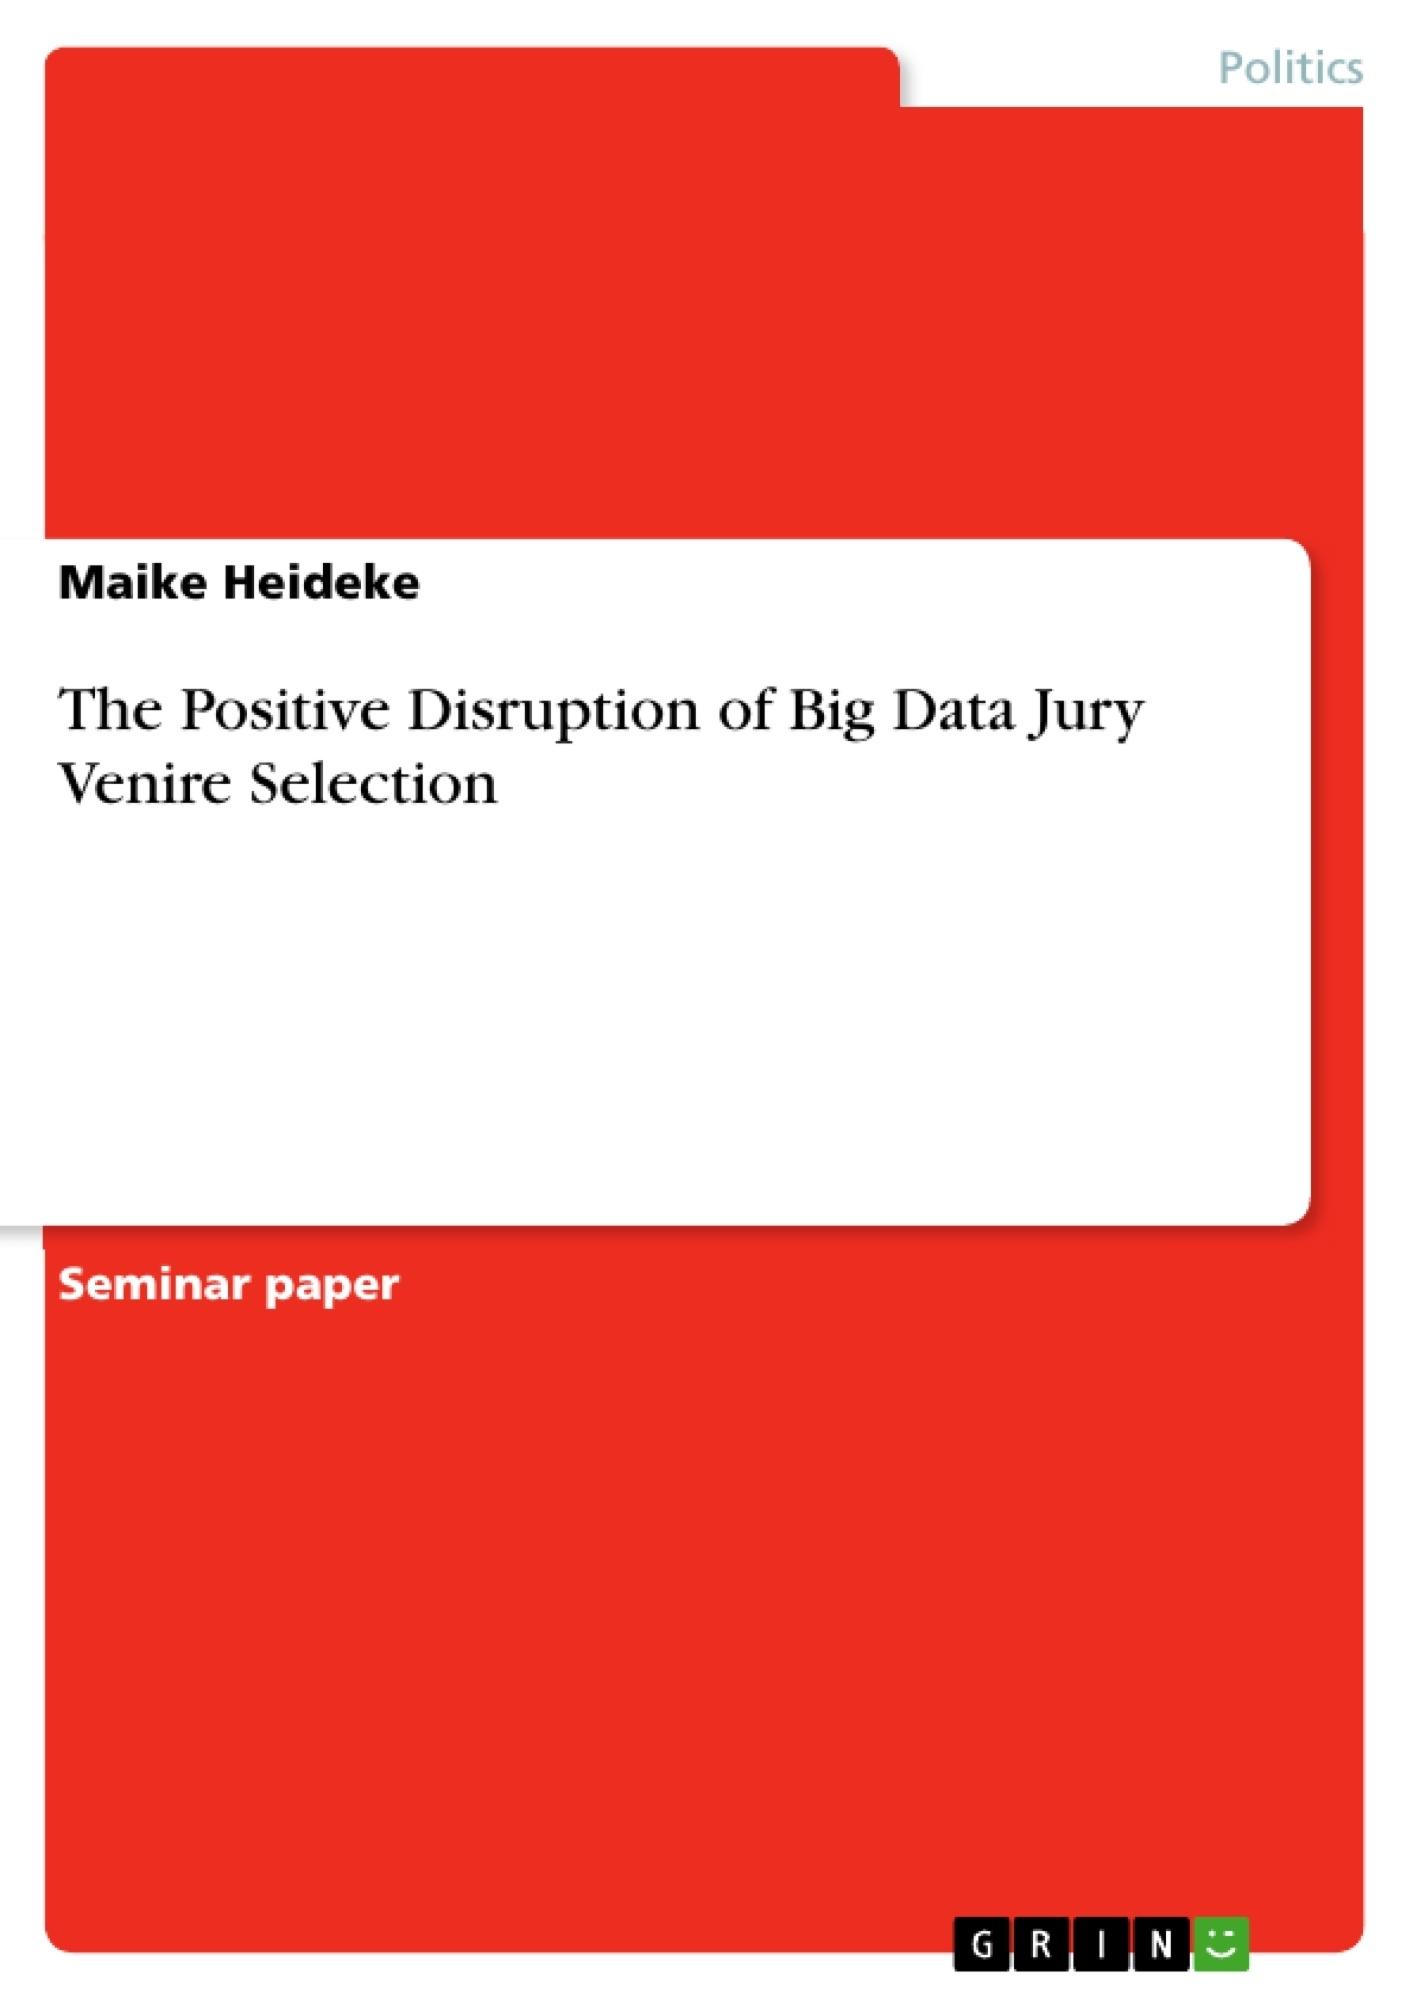 Title: The Positive Disruption of Big Data Jury Venire Selection